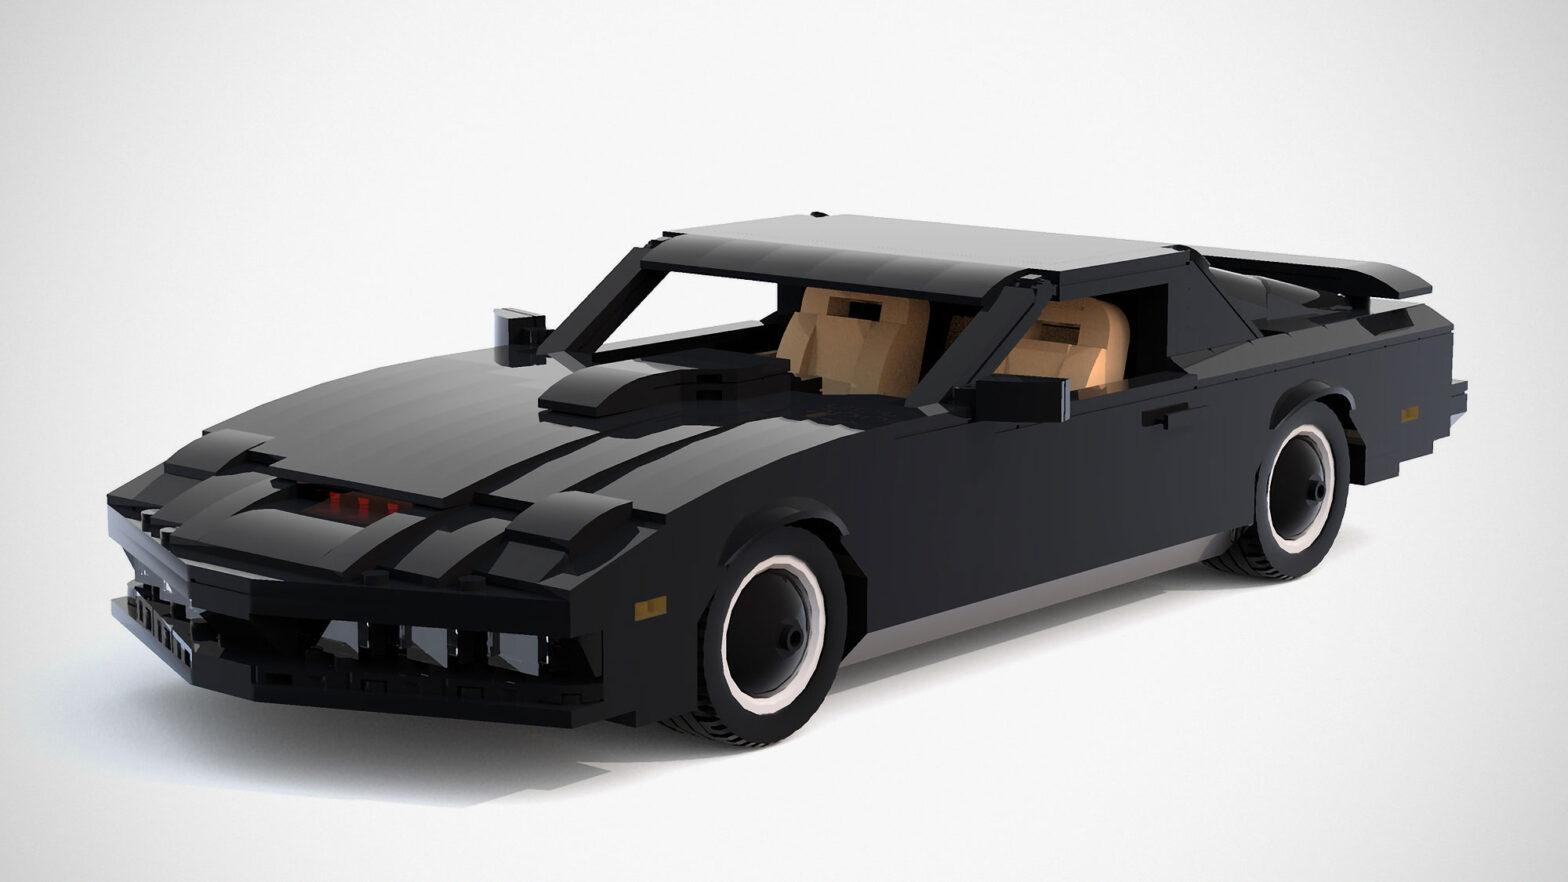 LEGO Knight Rider KITT by Jimmy-DK